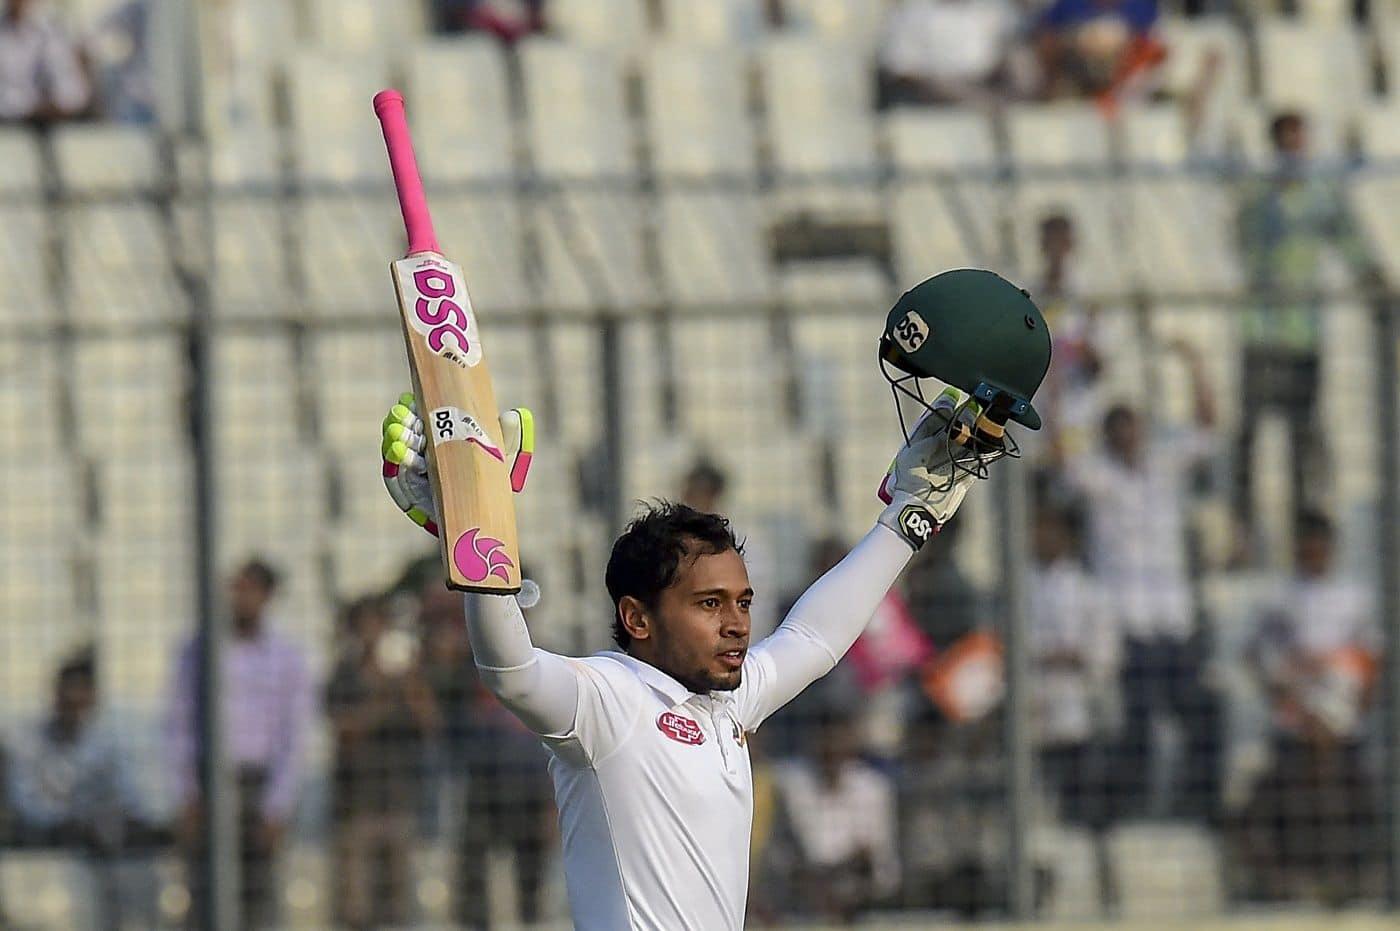 Bangladesh vs West Indies: Mushfiqur Rahim second Bangladesh cricketer to 4000 runs in Tests